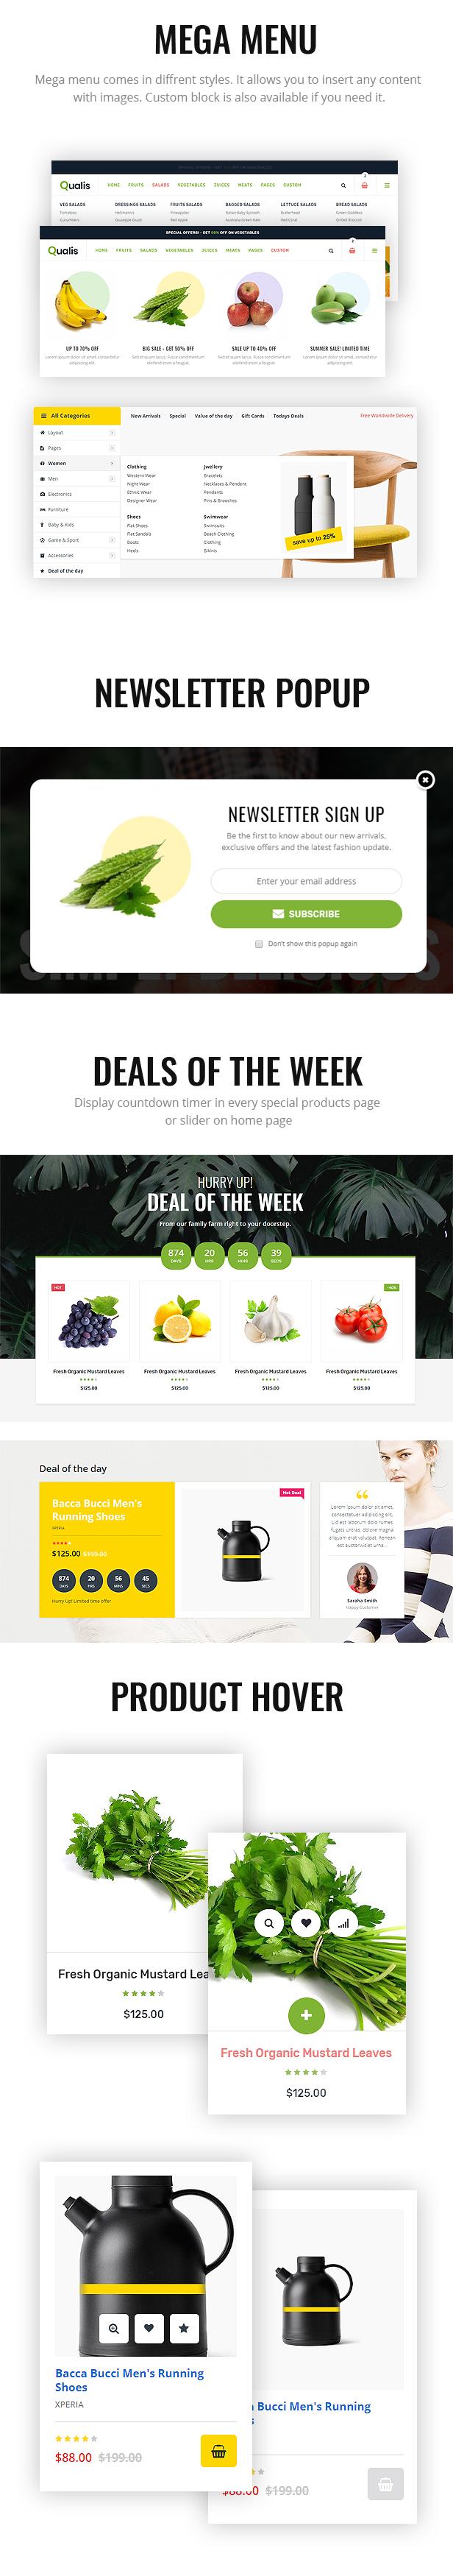 Qualis - Organic Food Responsive eCommerce WordPress Theme - 3